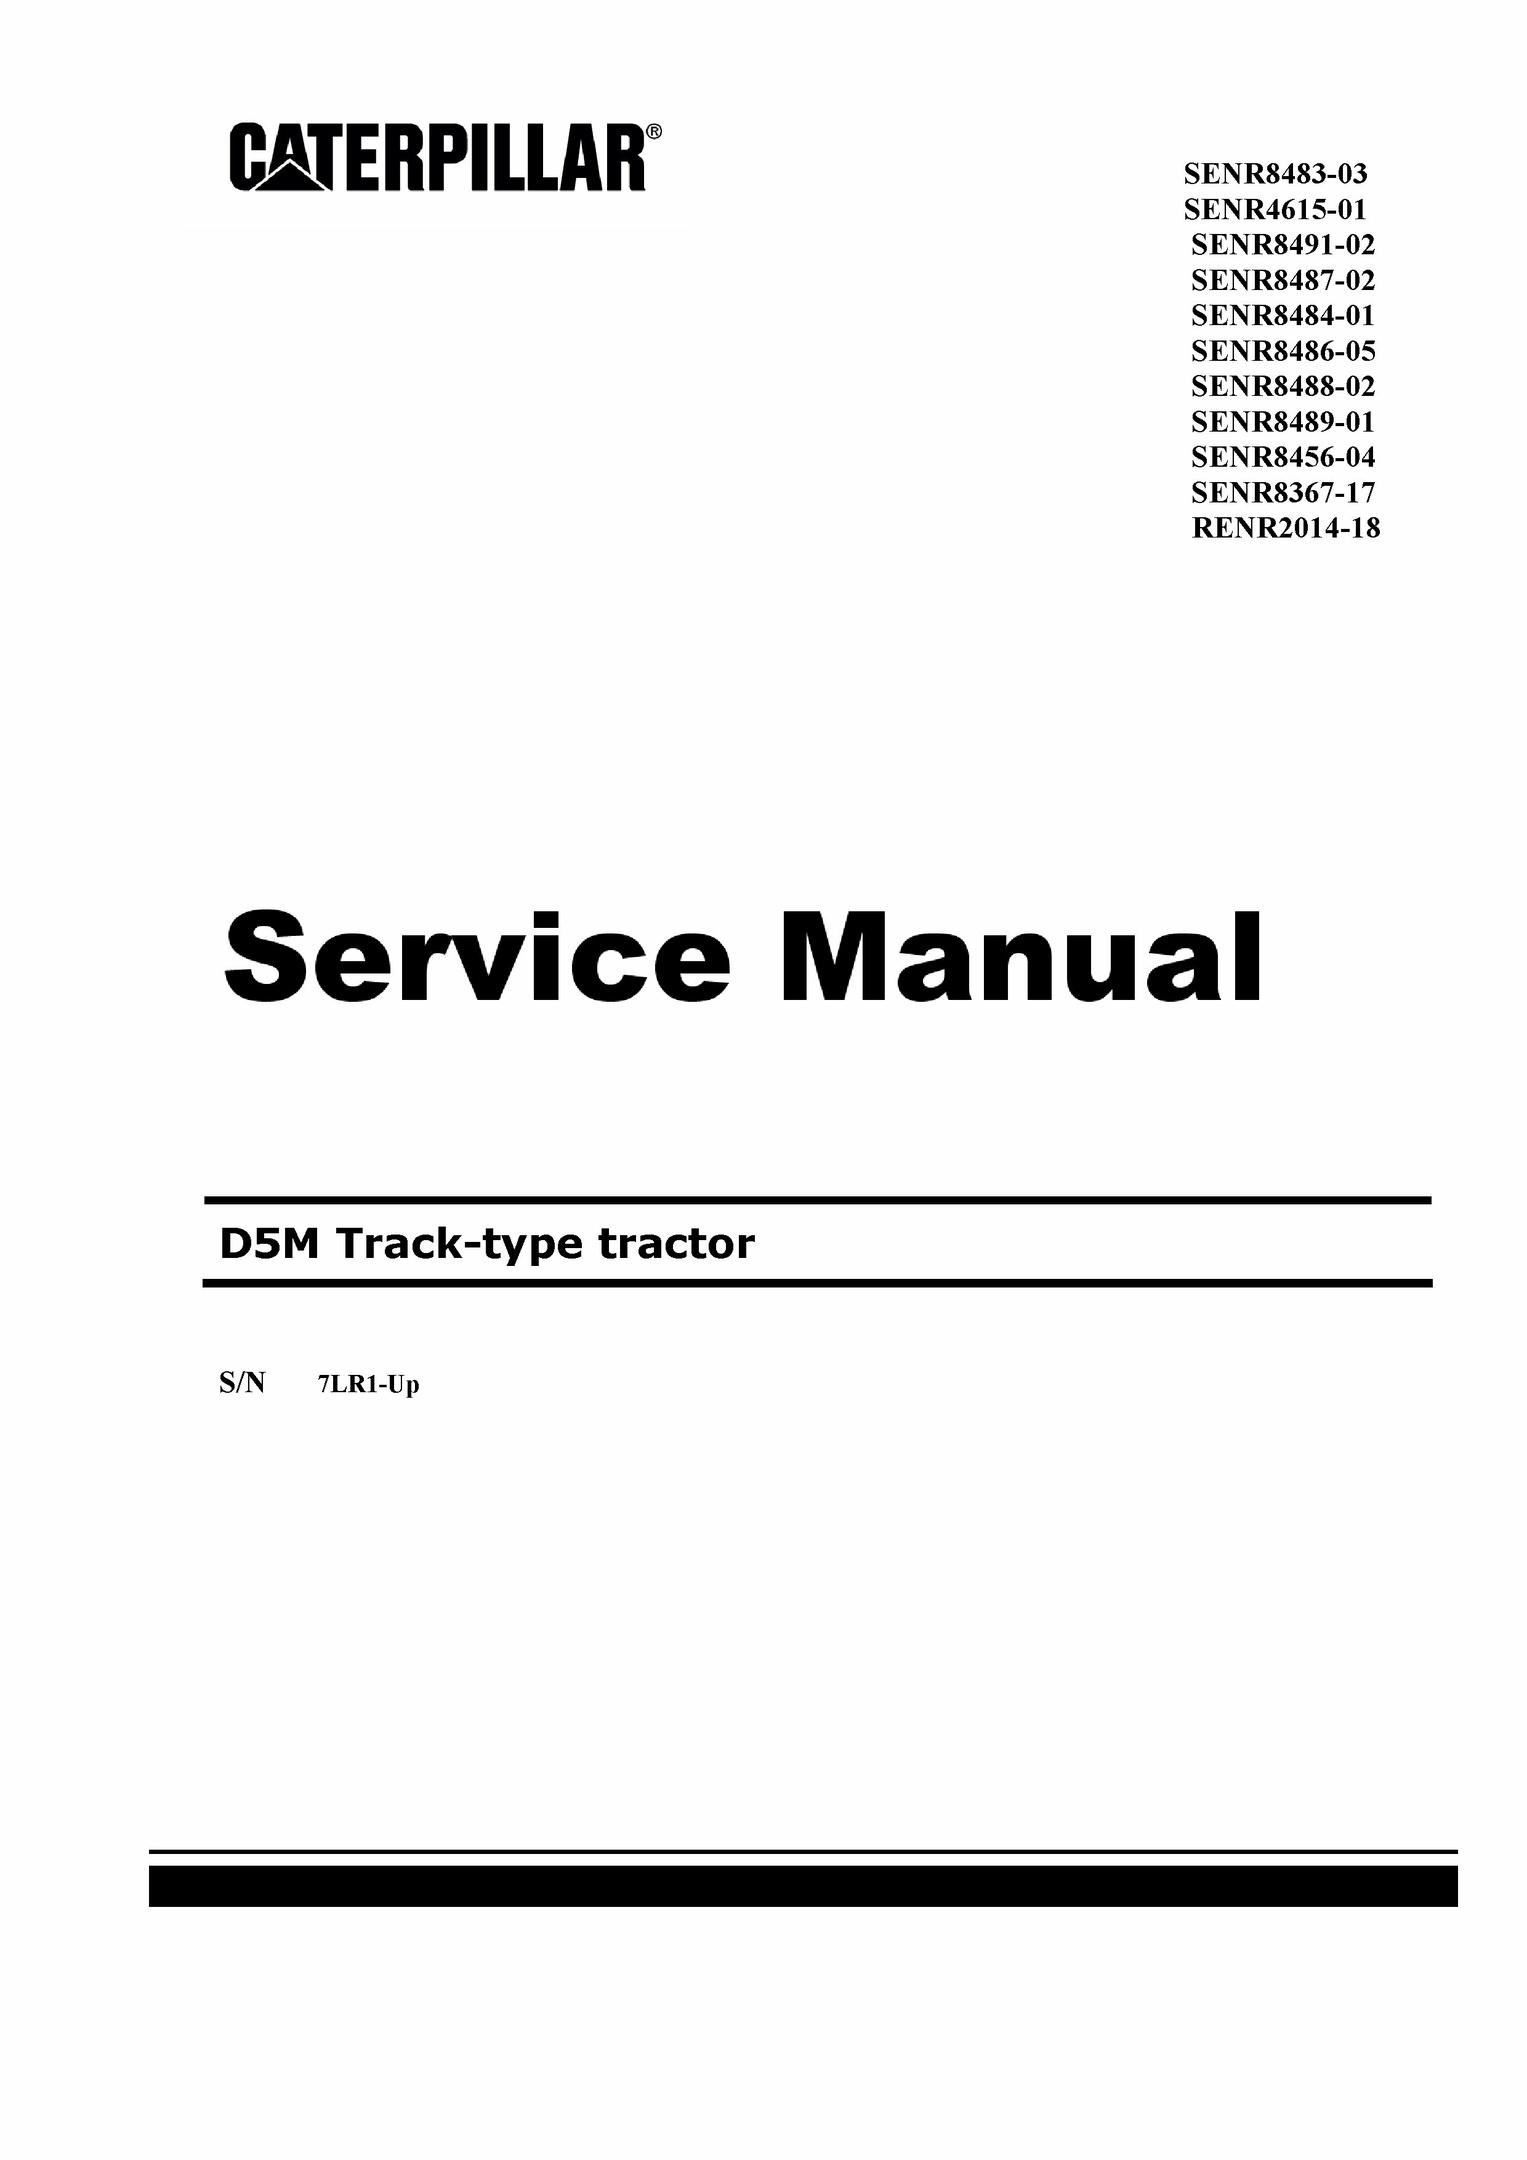 medium resolution of 3406 caterpillar service manual cat 3406 truck engine specs 3306 cat engine timing marks diagram